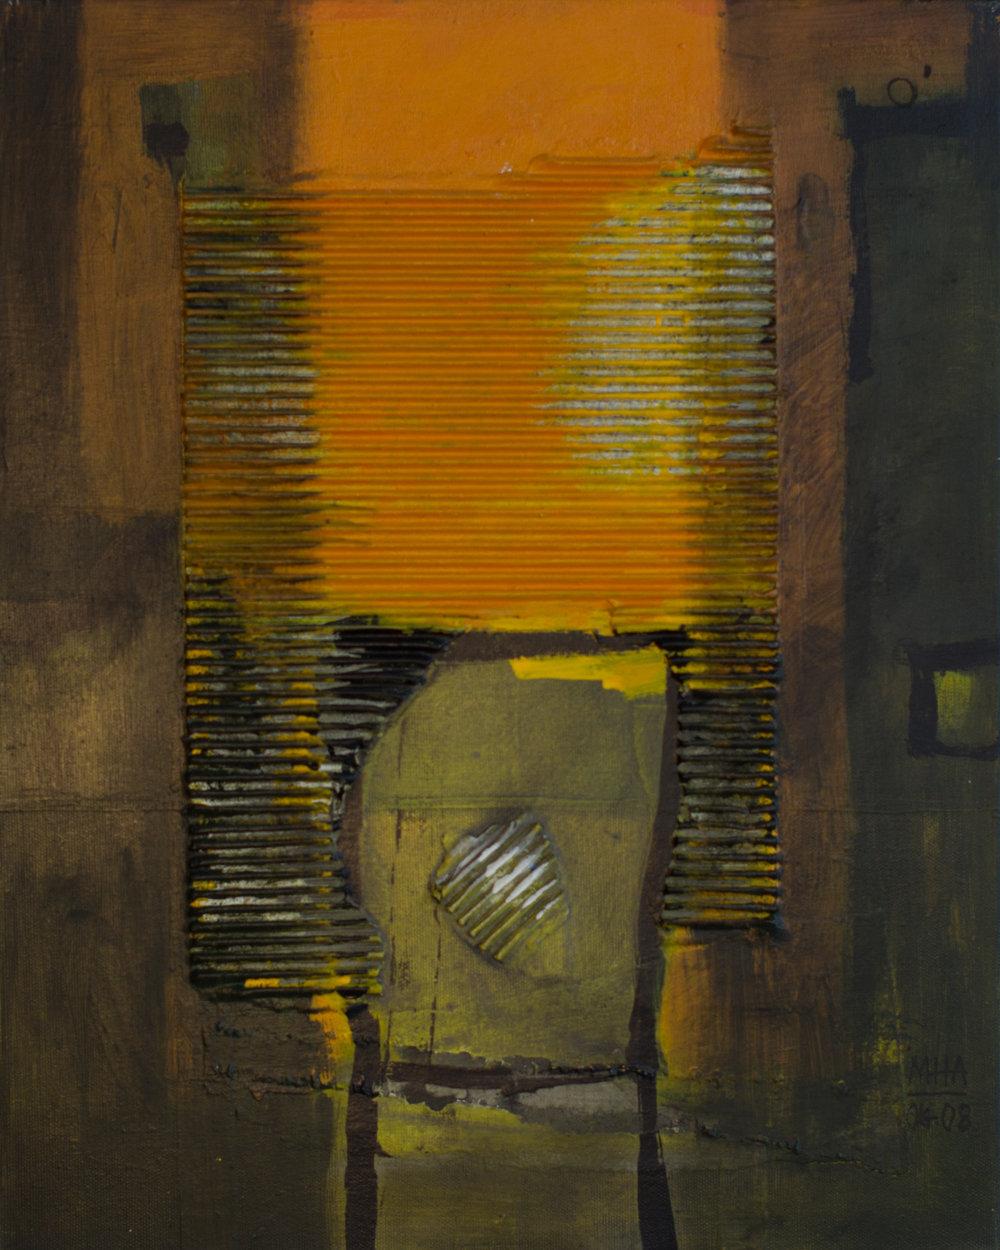 Theos 4 , 2008,Collage mit Acryl auf Leinwand, 40x52 cm